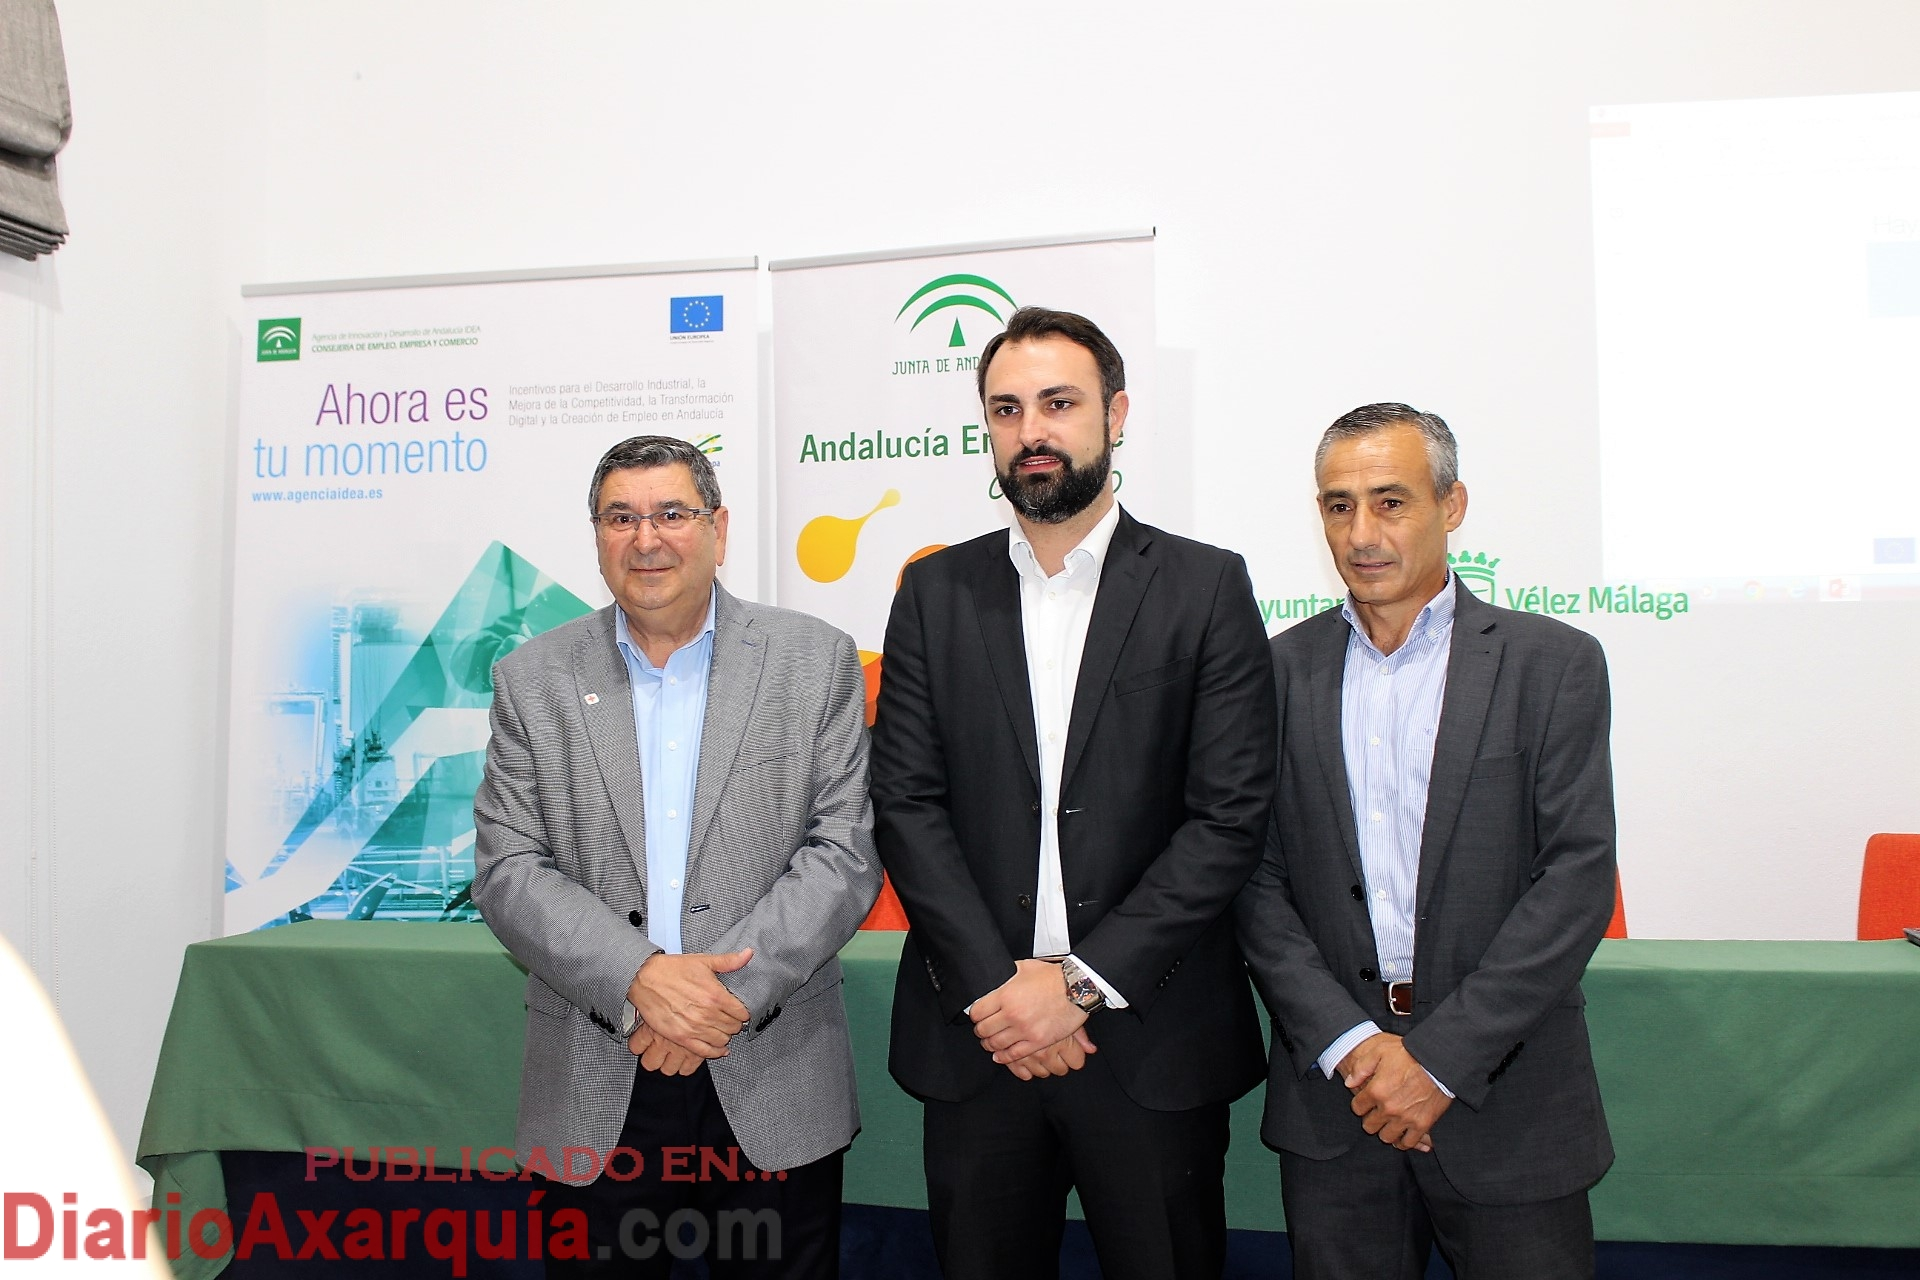 La junta de andaluc a presenta en v lez m laga ayudas for Oficina de empleo velez malaga